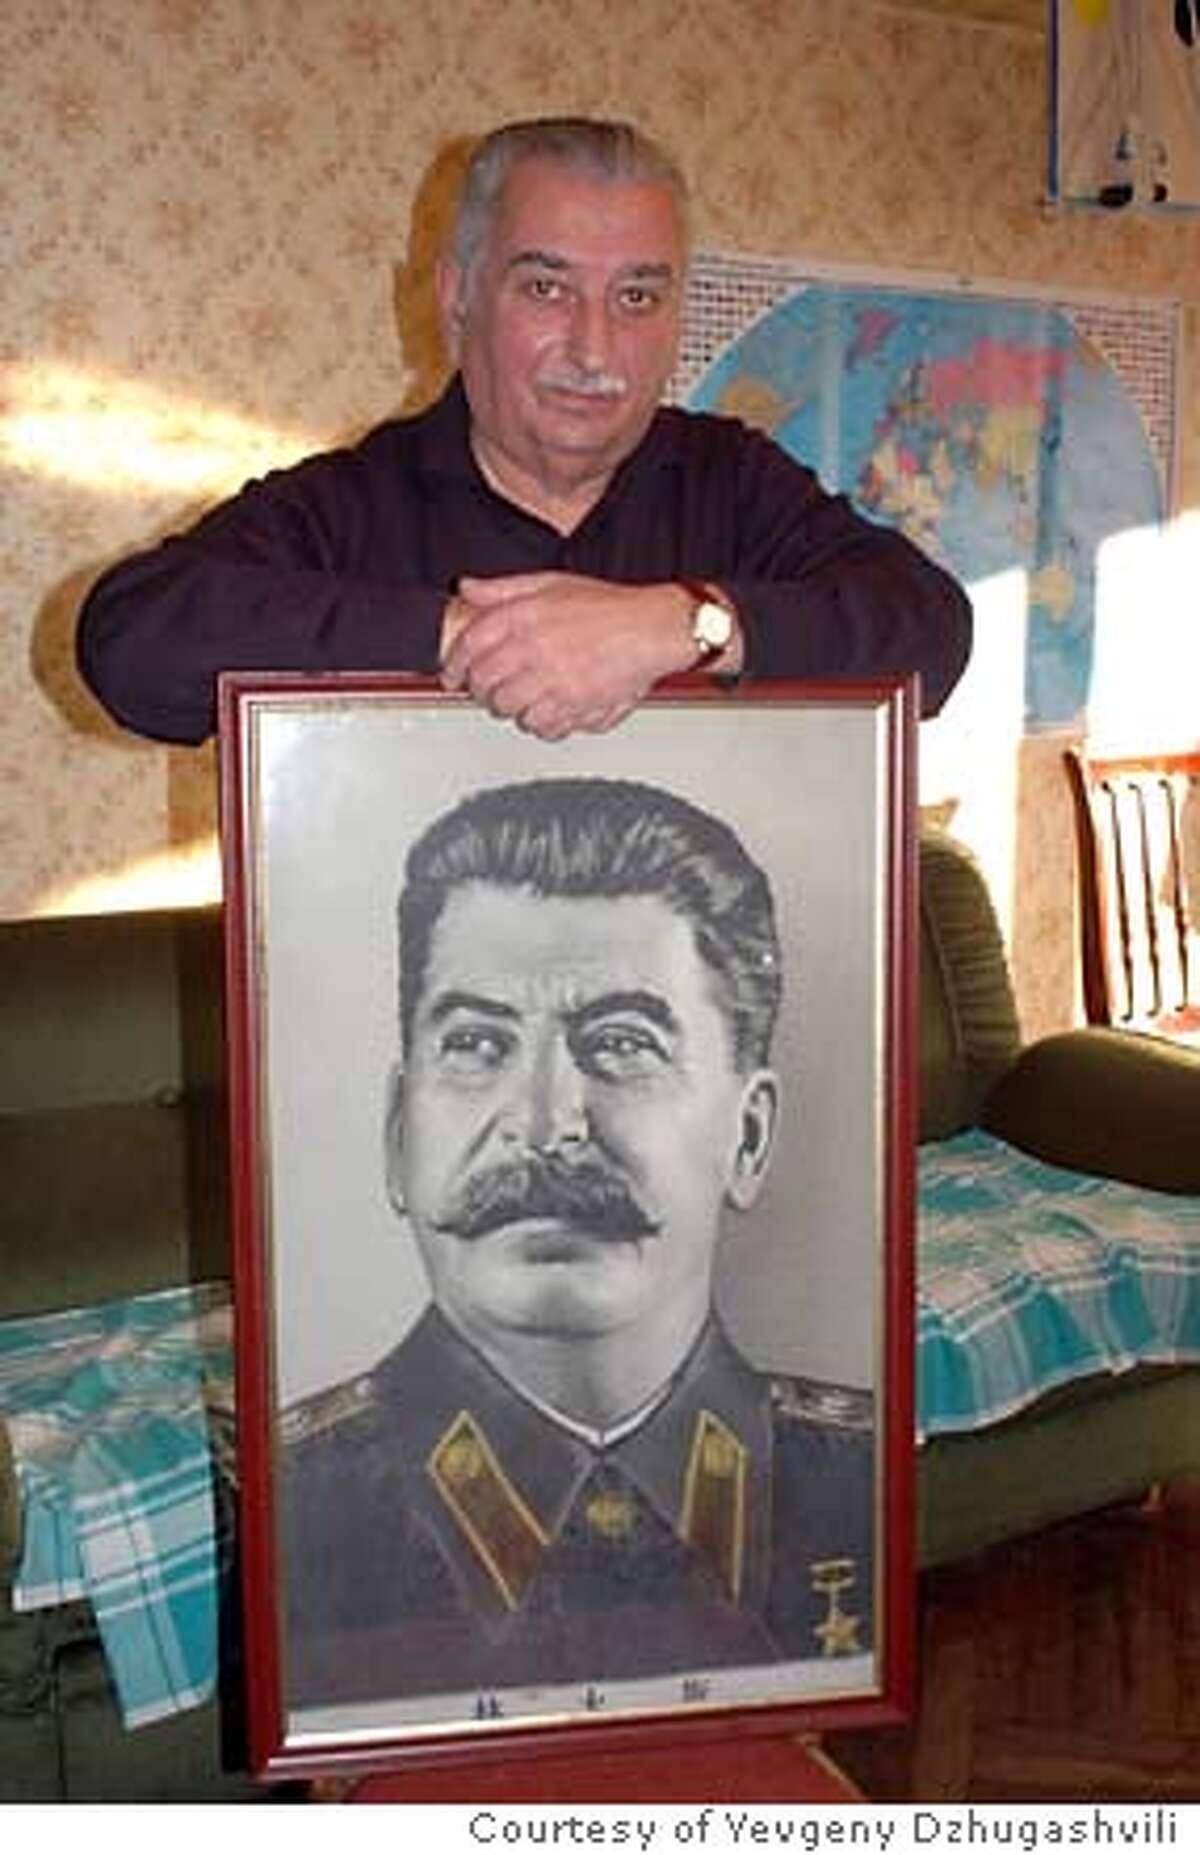 Portrait of Joseph Stalin with grandson holding framed portrait